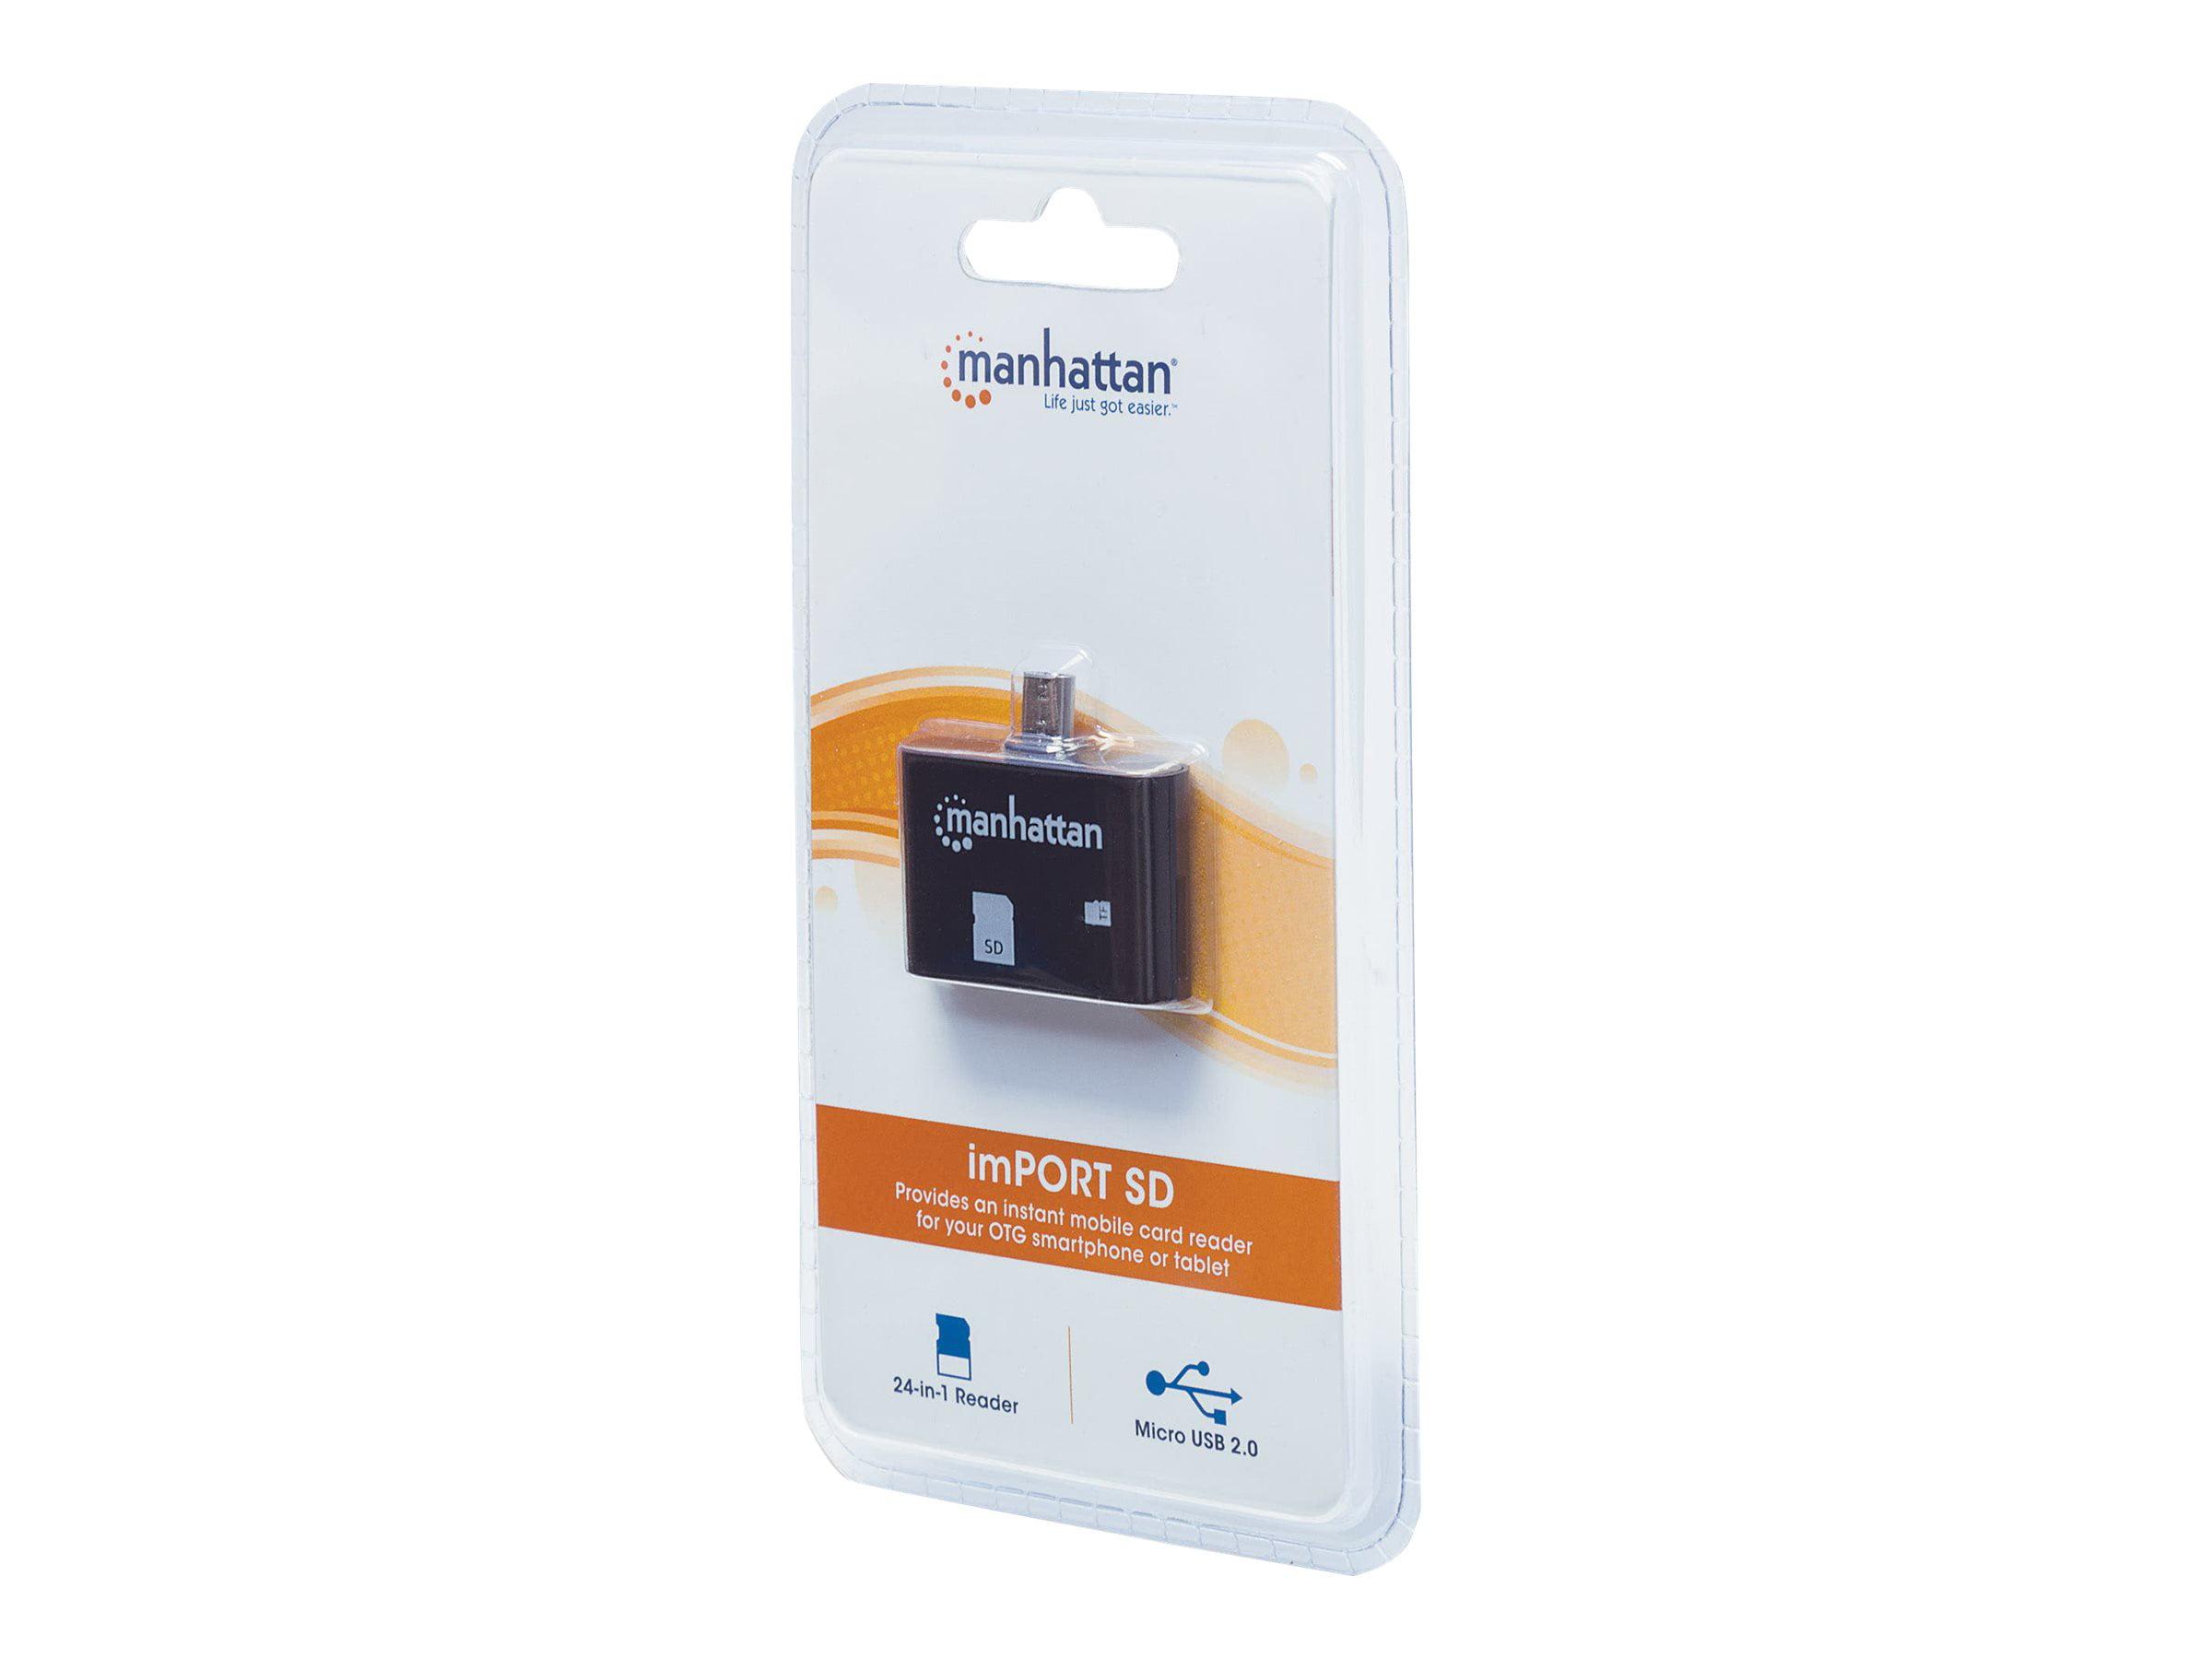 New USB2.0 Micro-B 24-in-1 Card Reader//Writer Mobile OTG Adapter Manhattan 406208